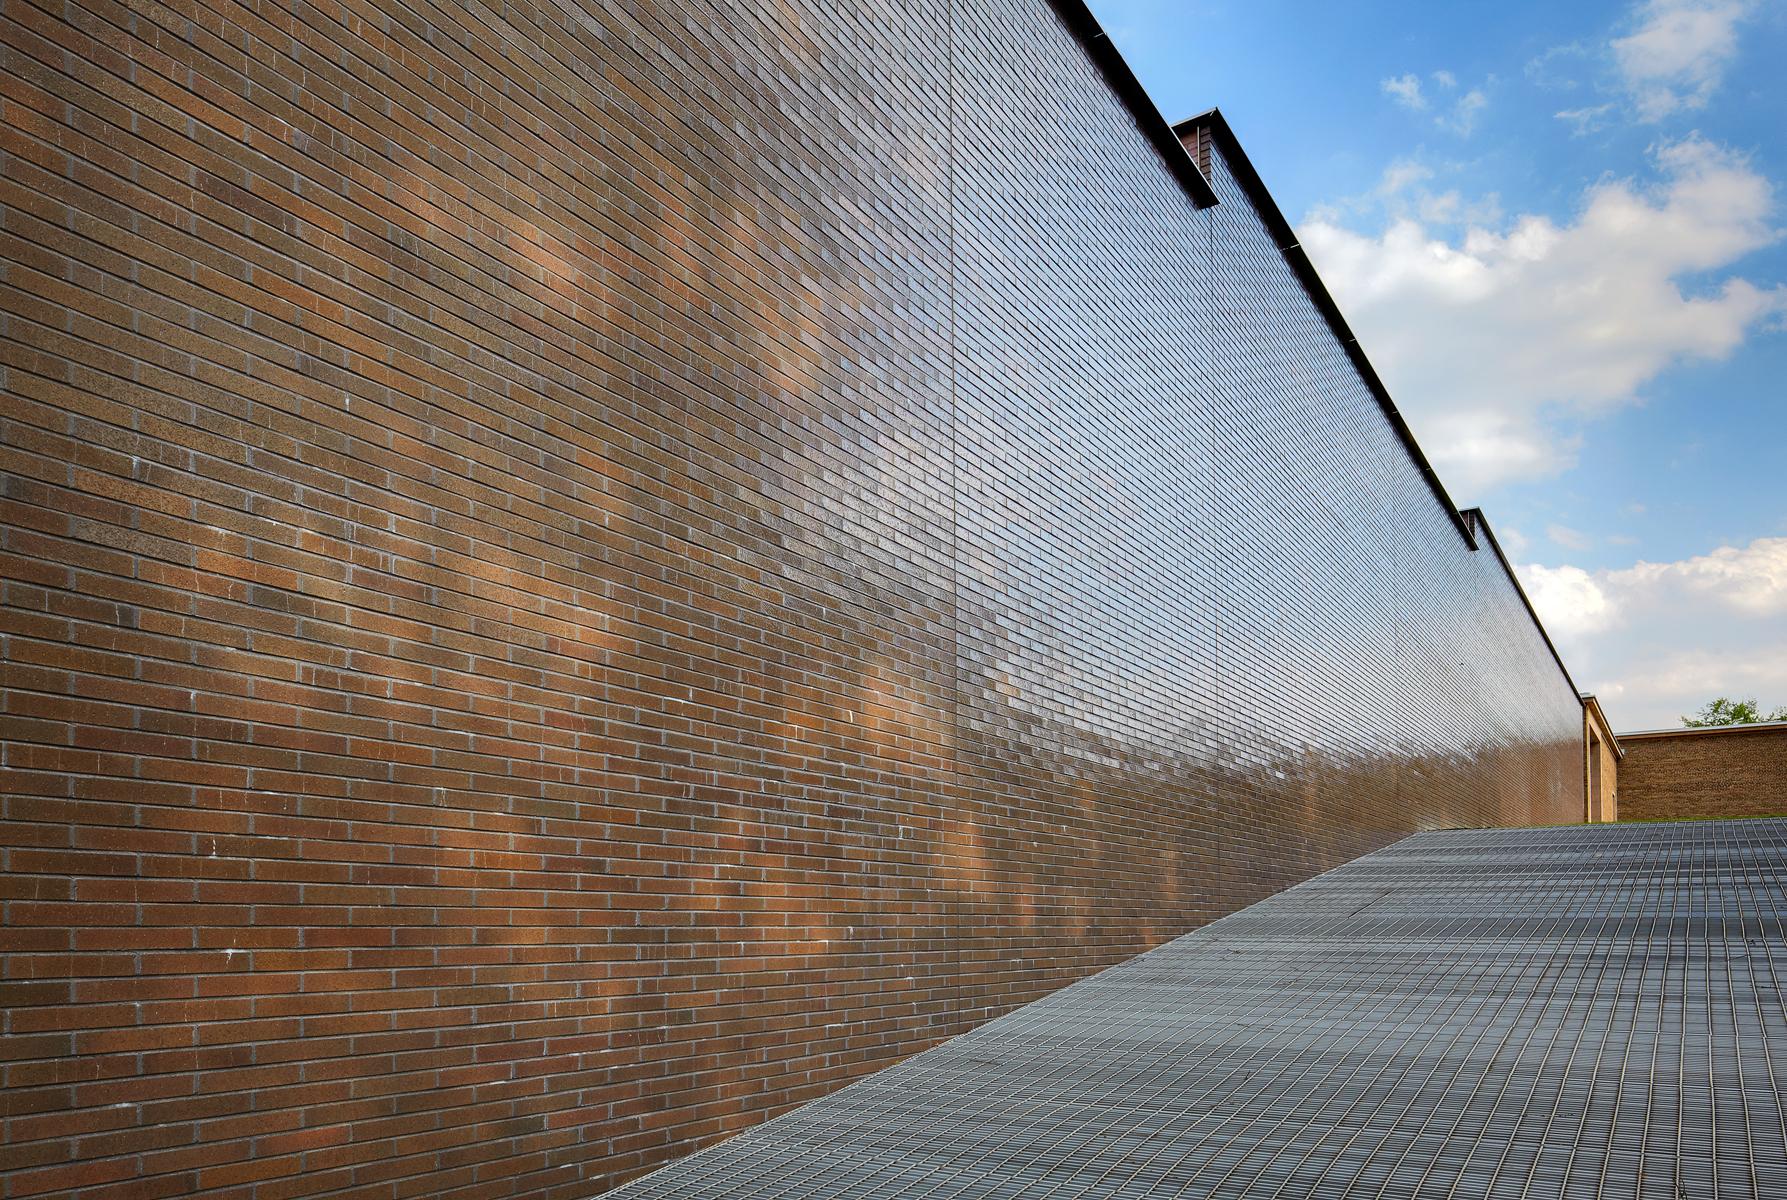 Study Brick Buildings Cost Less than Precast Metal and Glass Masonry Construction  Brick